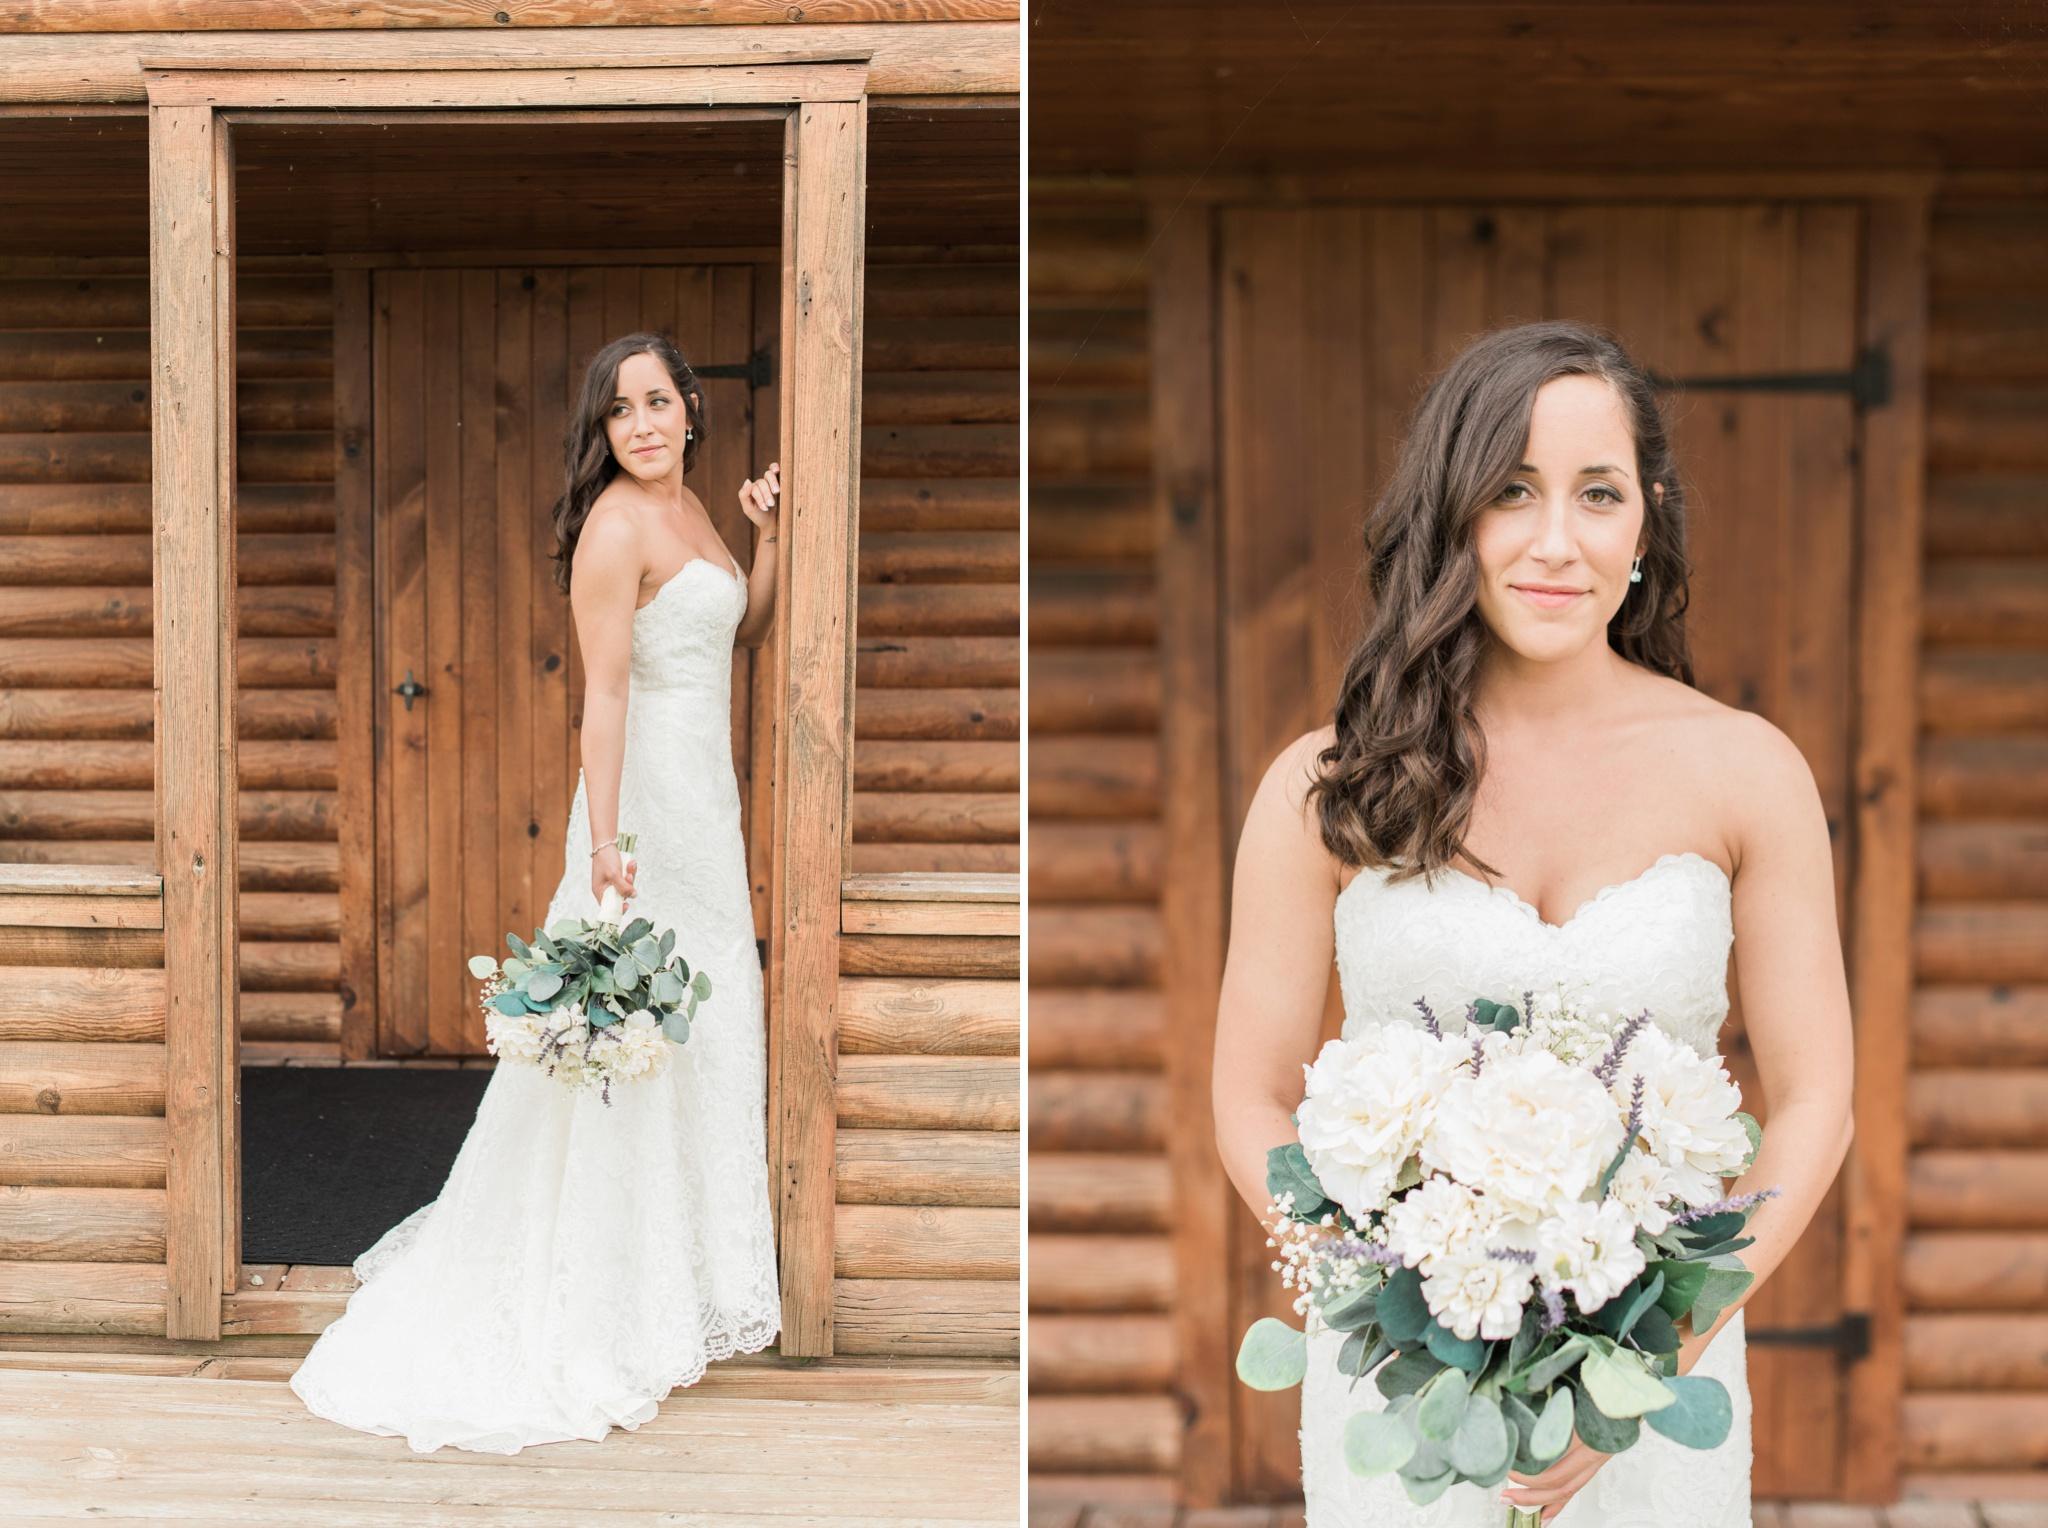 niederman-farm-wedding-cincinnati-ohio-photographer_0019.jpg